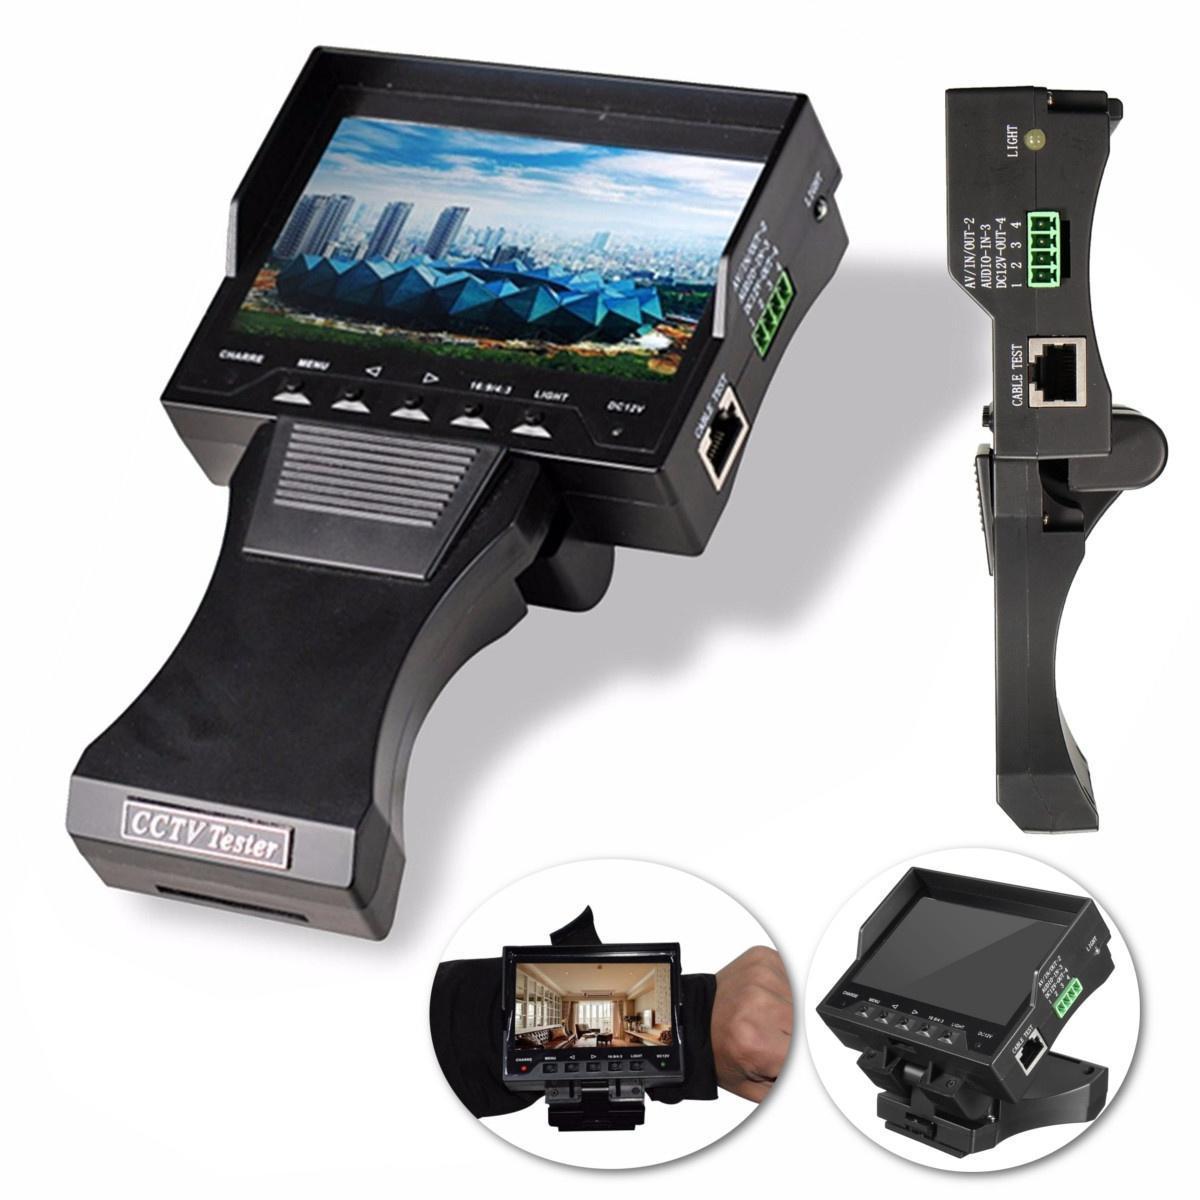 Складной 4,3-дюймовый LCD CCTV камеры тестер Monitor Net кабель тест аудио видео безопасность питер торстейнсон криптография и безопасность в технологии net